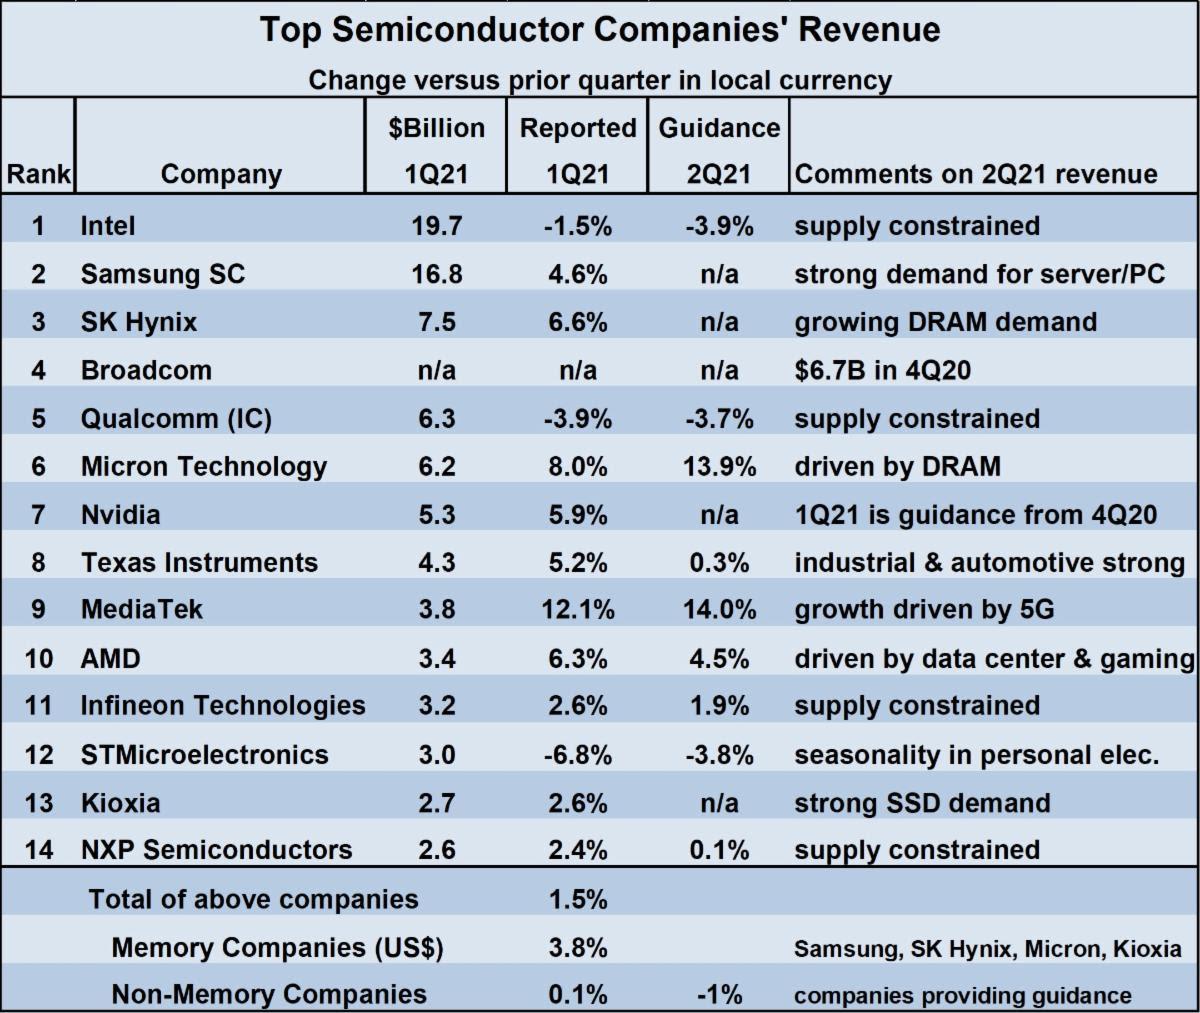 Top Semiconductor Revenues 2021